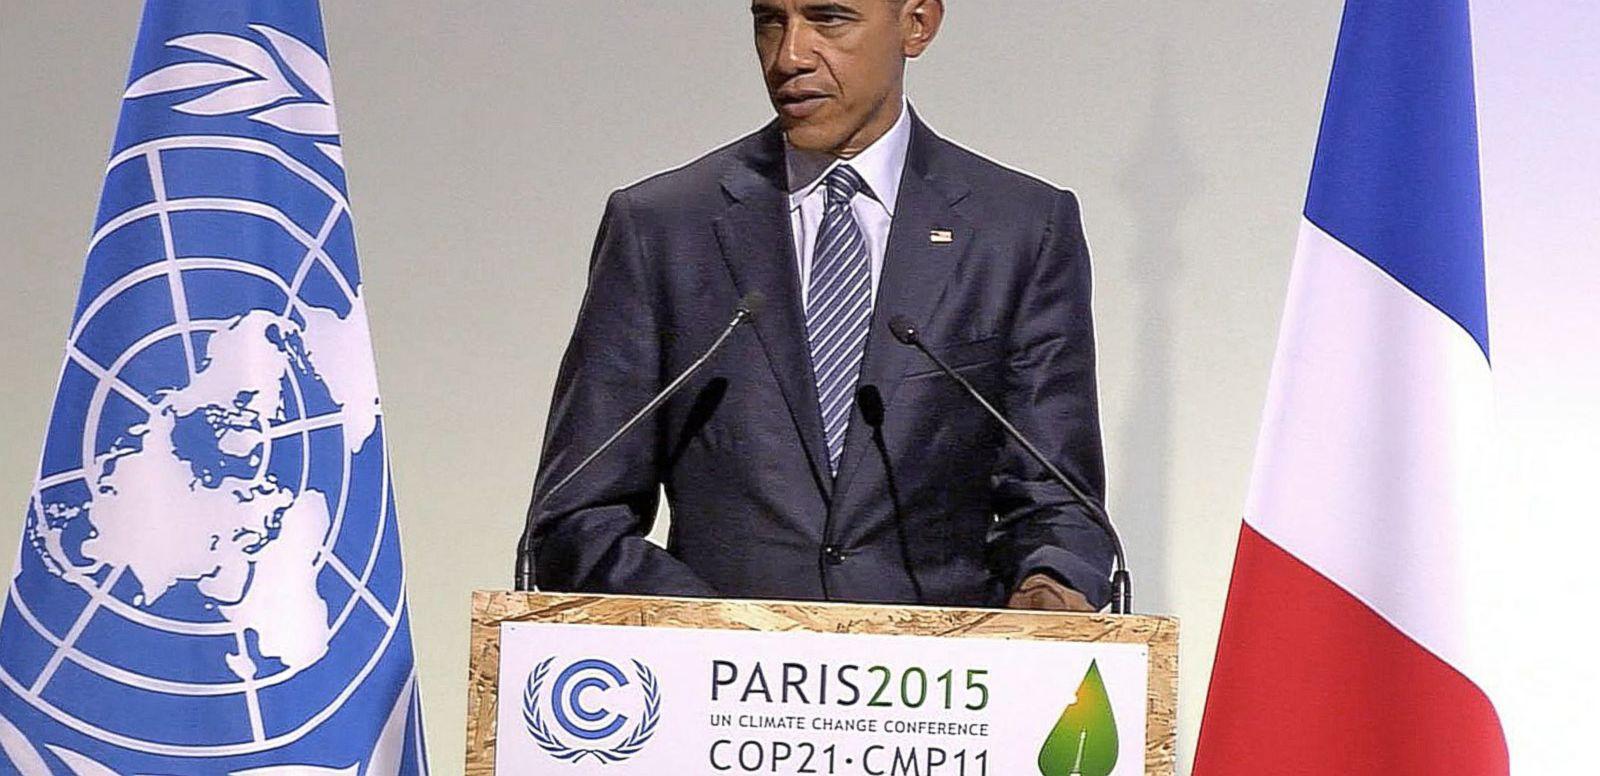 VIDEO: Paris Climate Talks Move Forward Despite Recent Terror Attacks